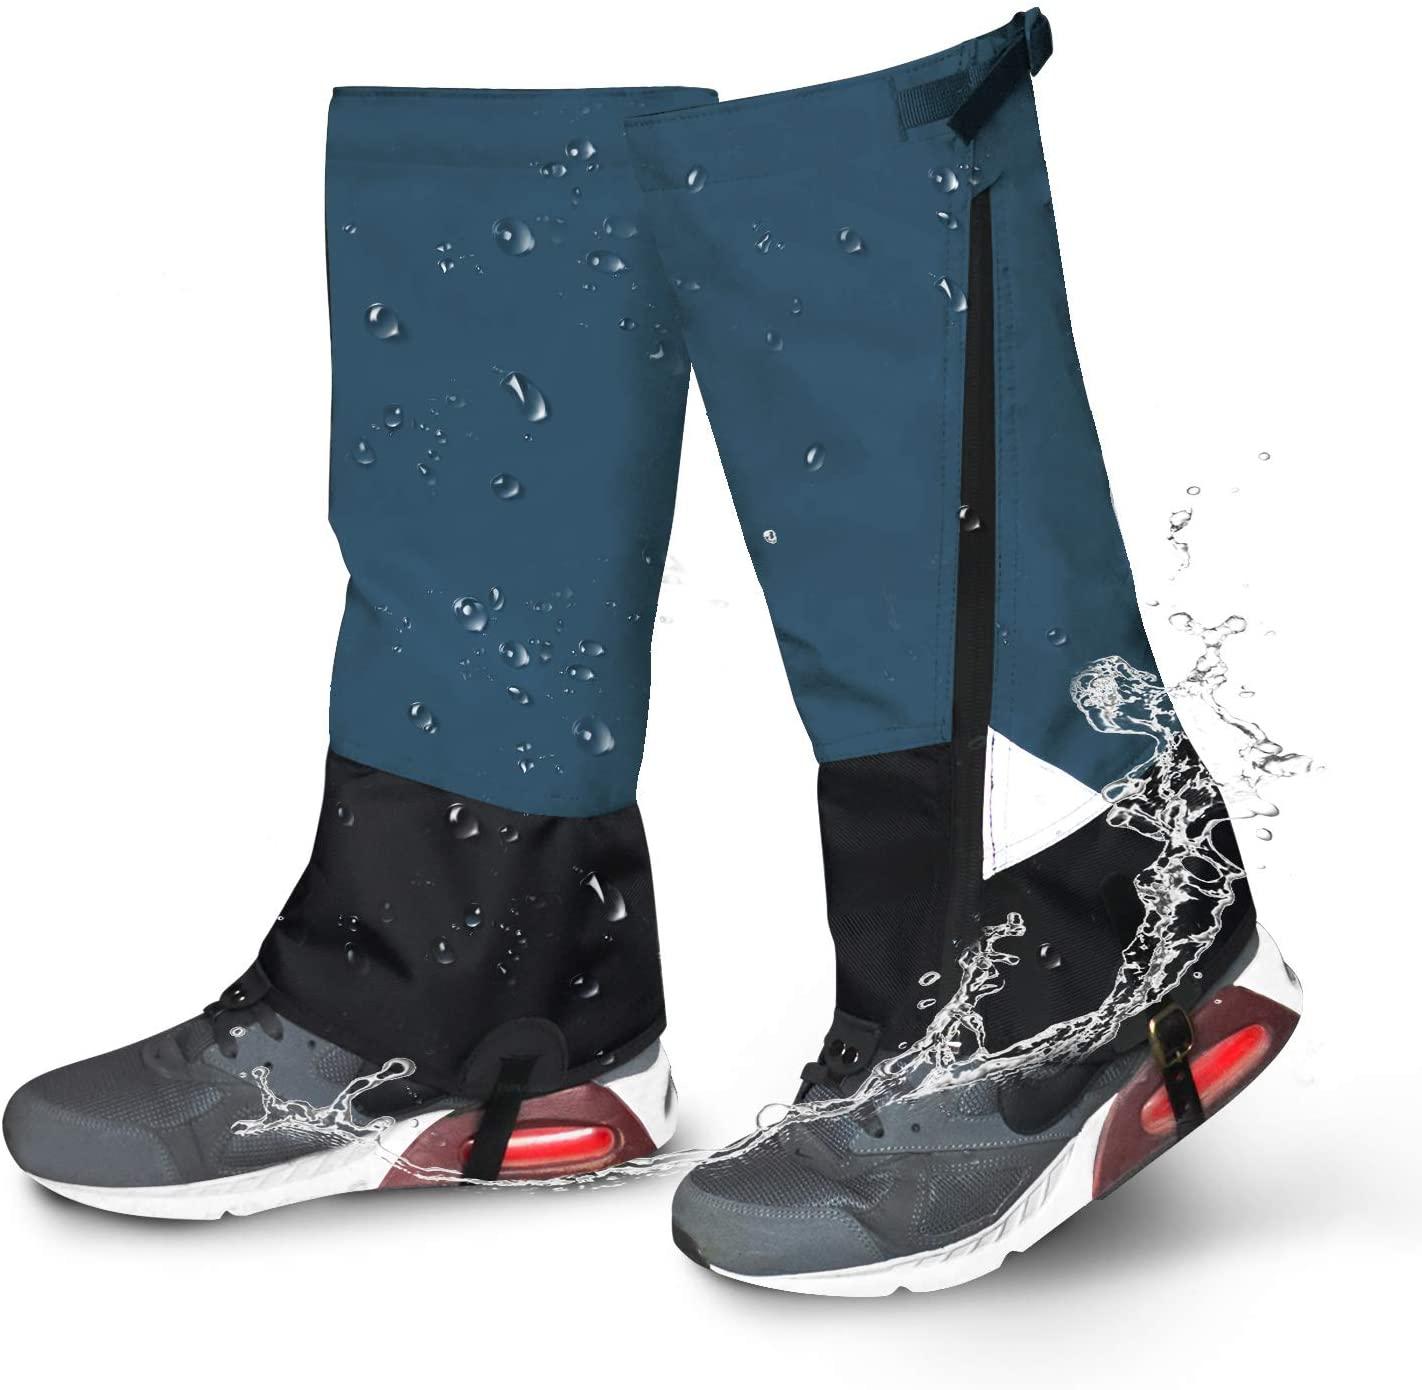 Leg Gaiters Waterproof Snow Boot Gaiters 900D Anti-Tear Adjustable Shoes Gaiters High Leg Cover for Men Women Outdoor Hiking Walking Hunting Skiing Snowshoeing Camping Climbing